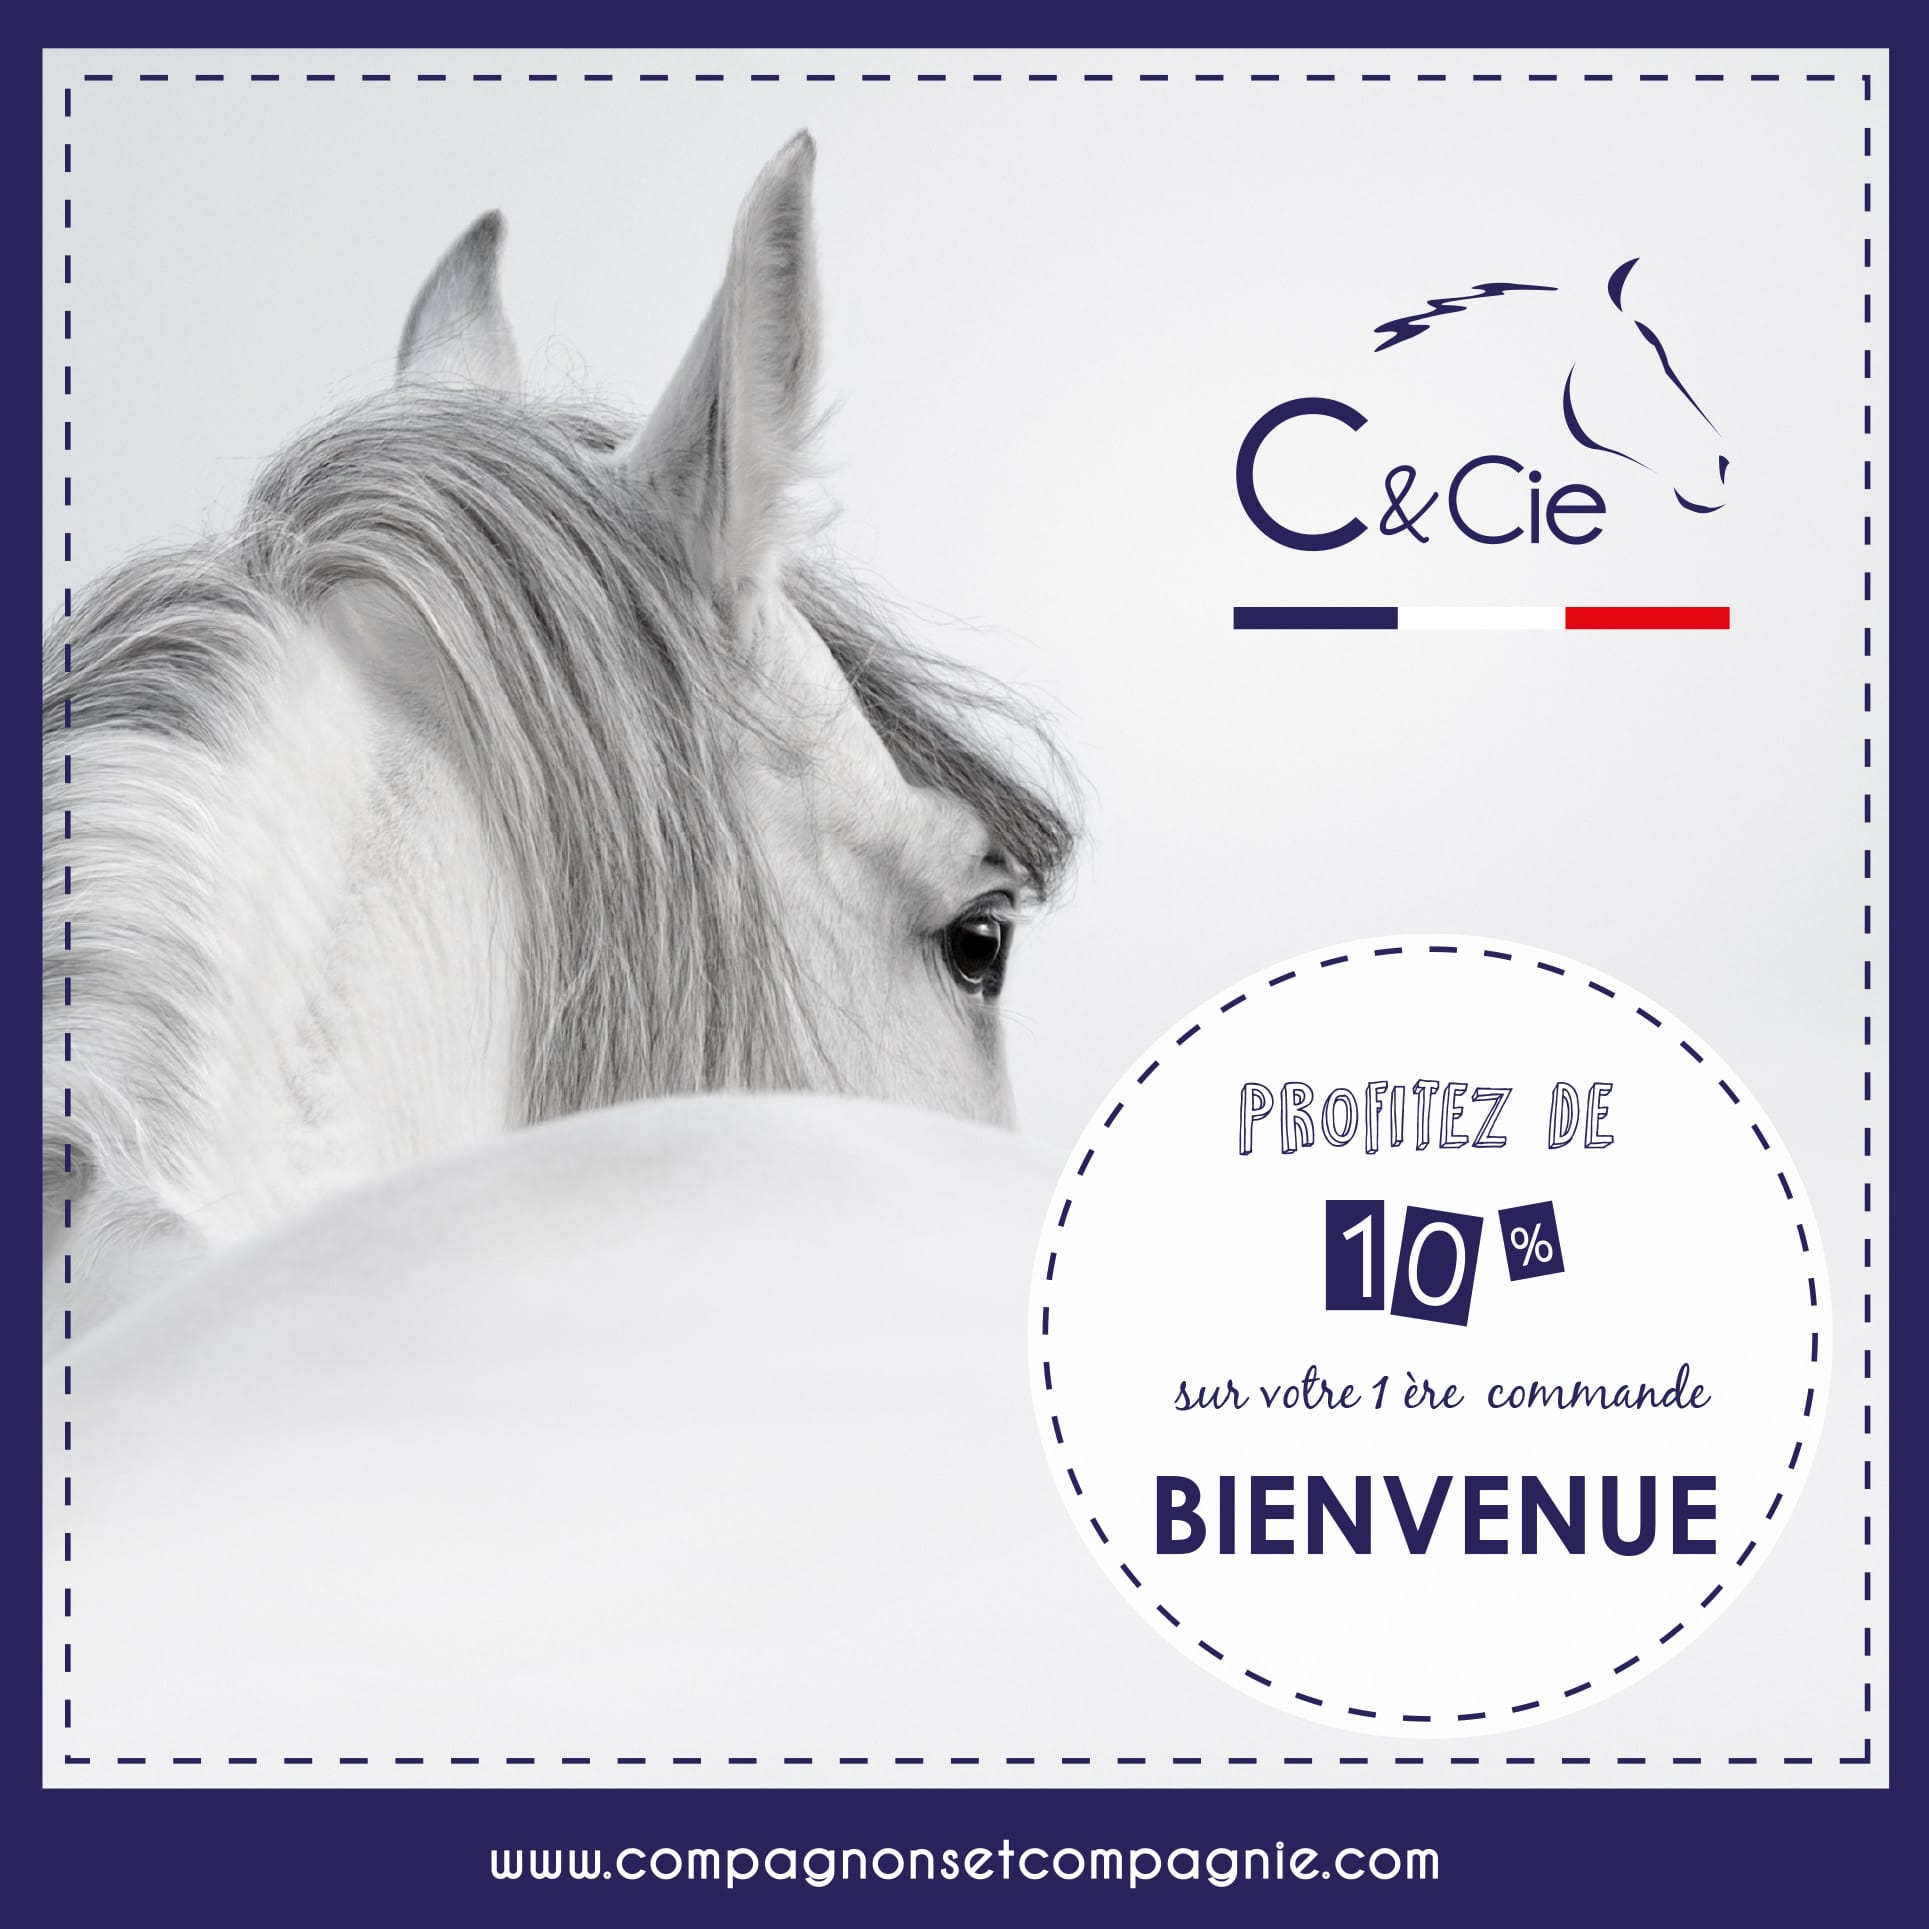 Soin naturel pour cheval - Aromatherapie Equine